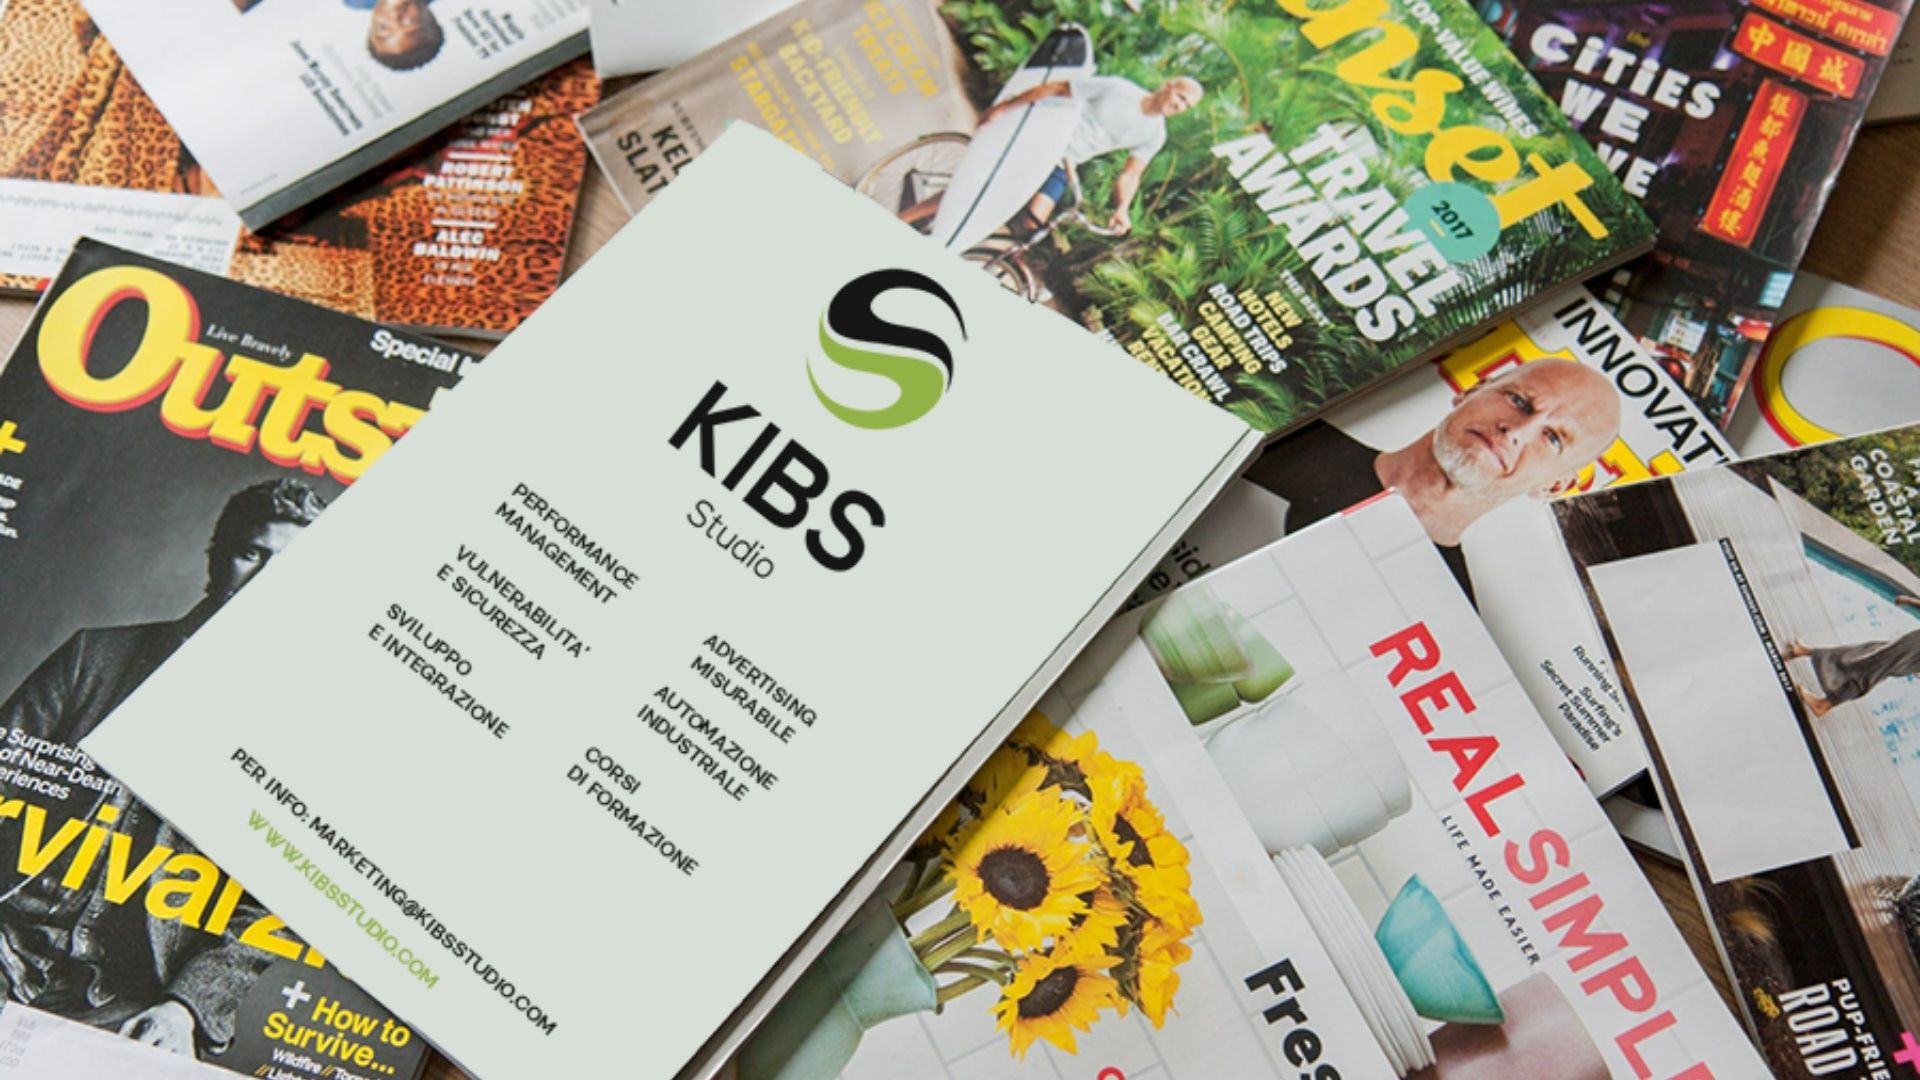 Direct marketing KIBS Studio